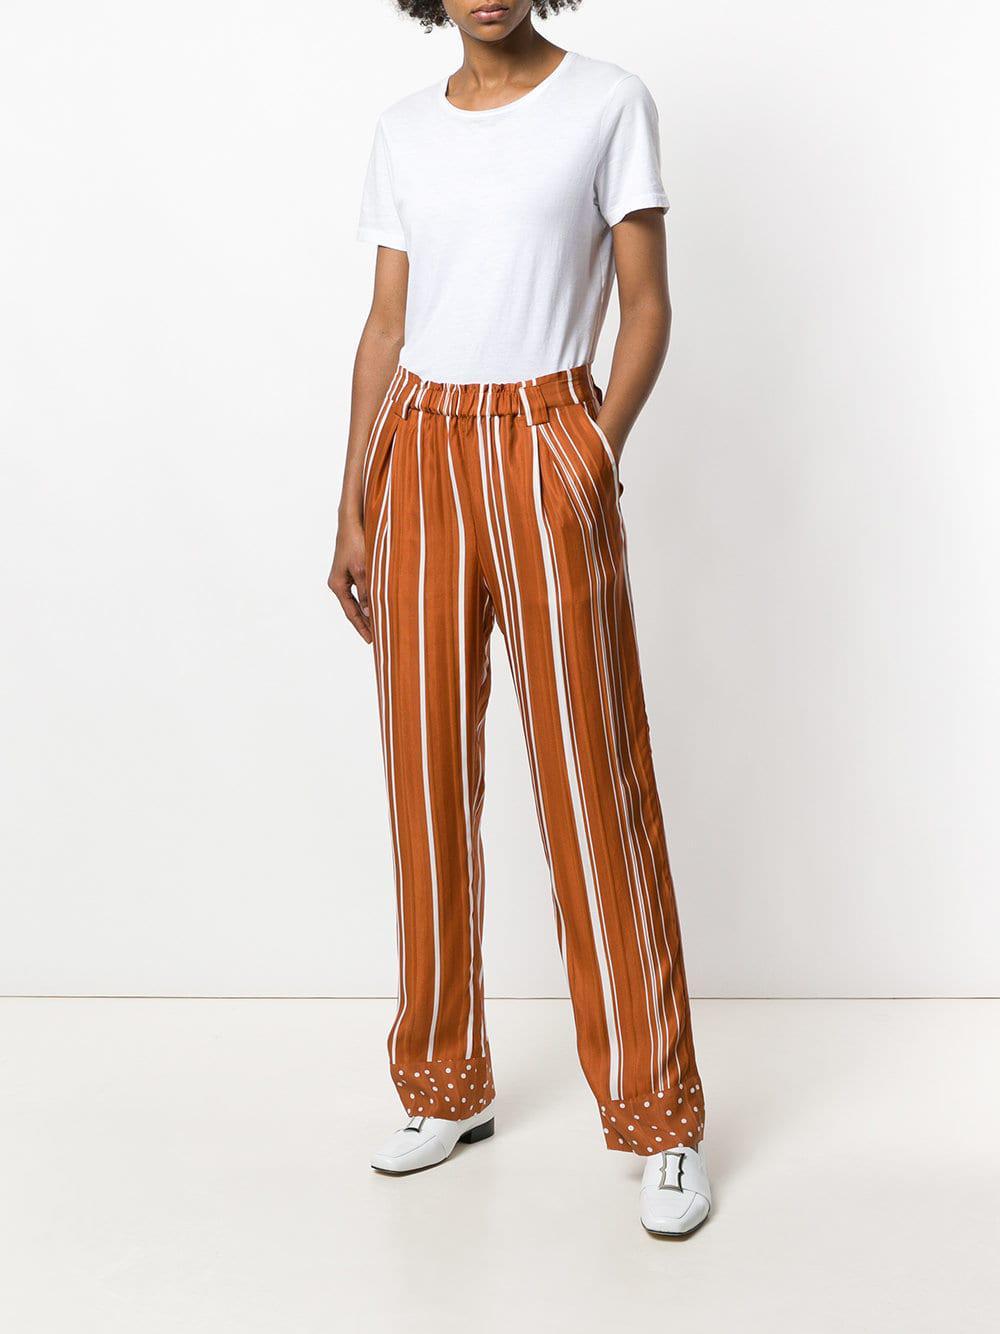 rayas de Lyst Stine puntos impresión naranja pantalones Goya y qRa4aZWTw